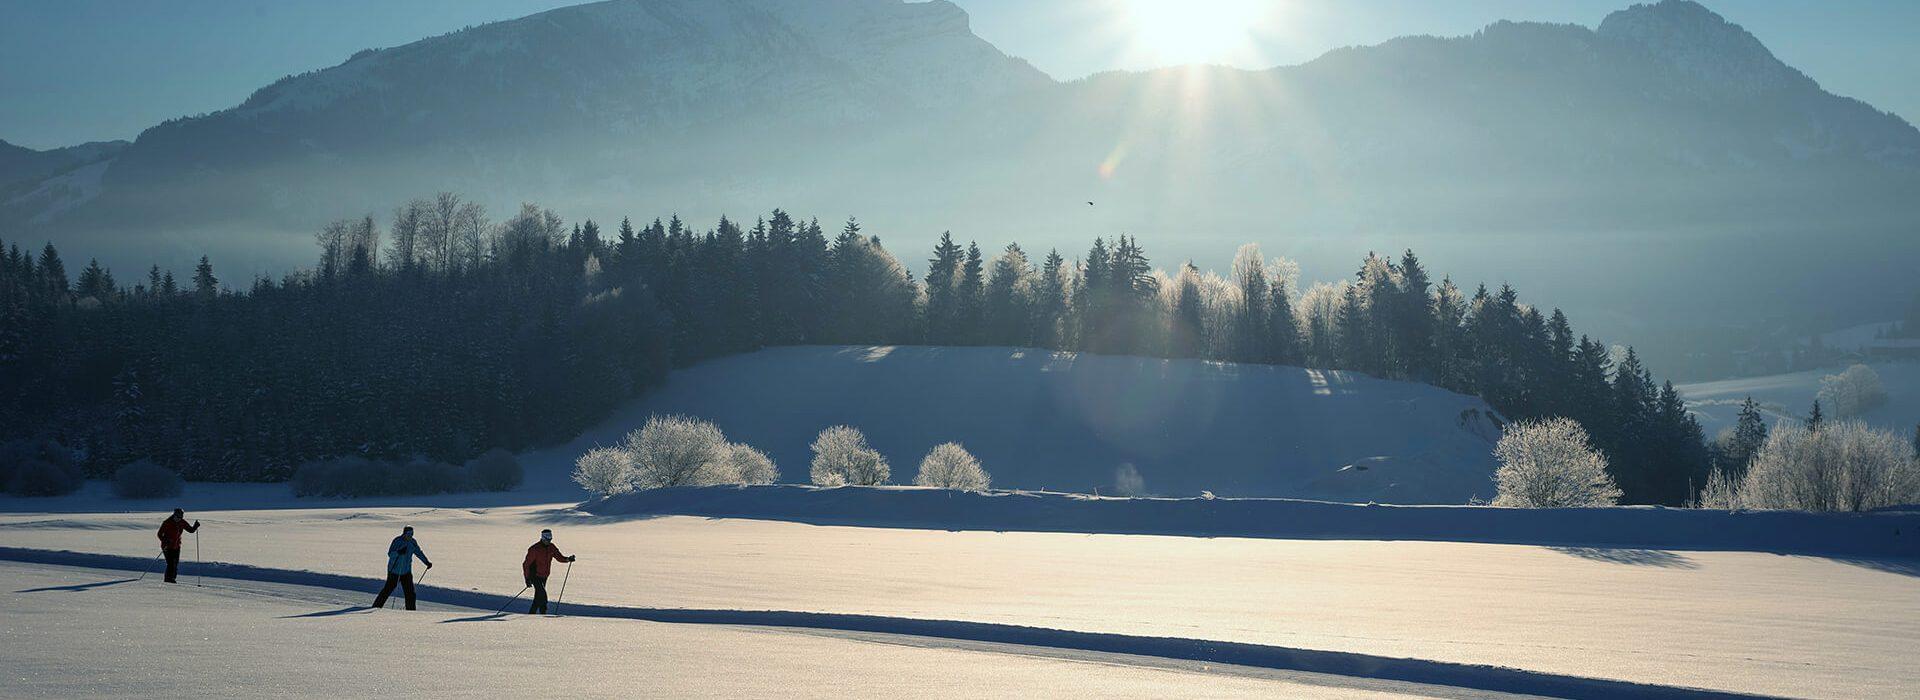 Langlaufen in Tirol ©Bernhard Bergmann